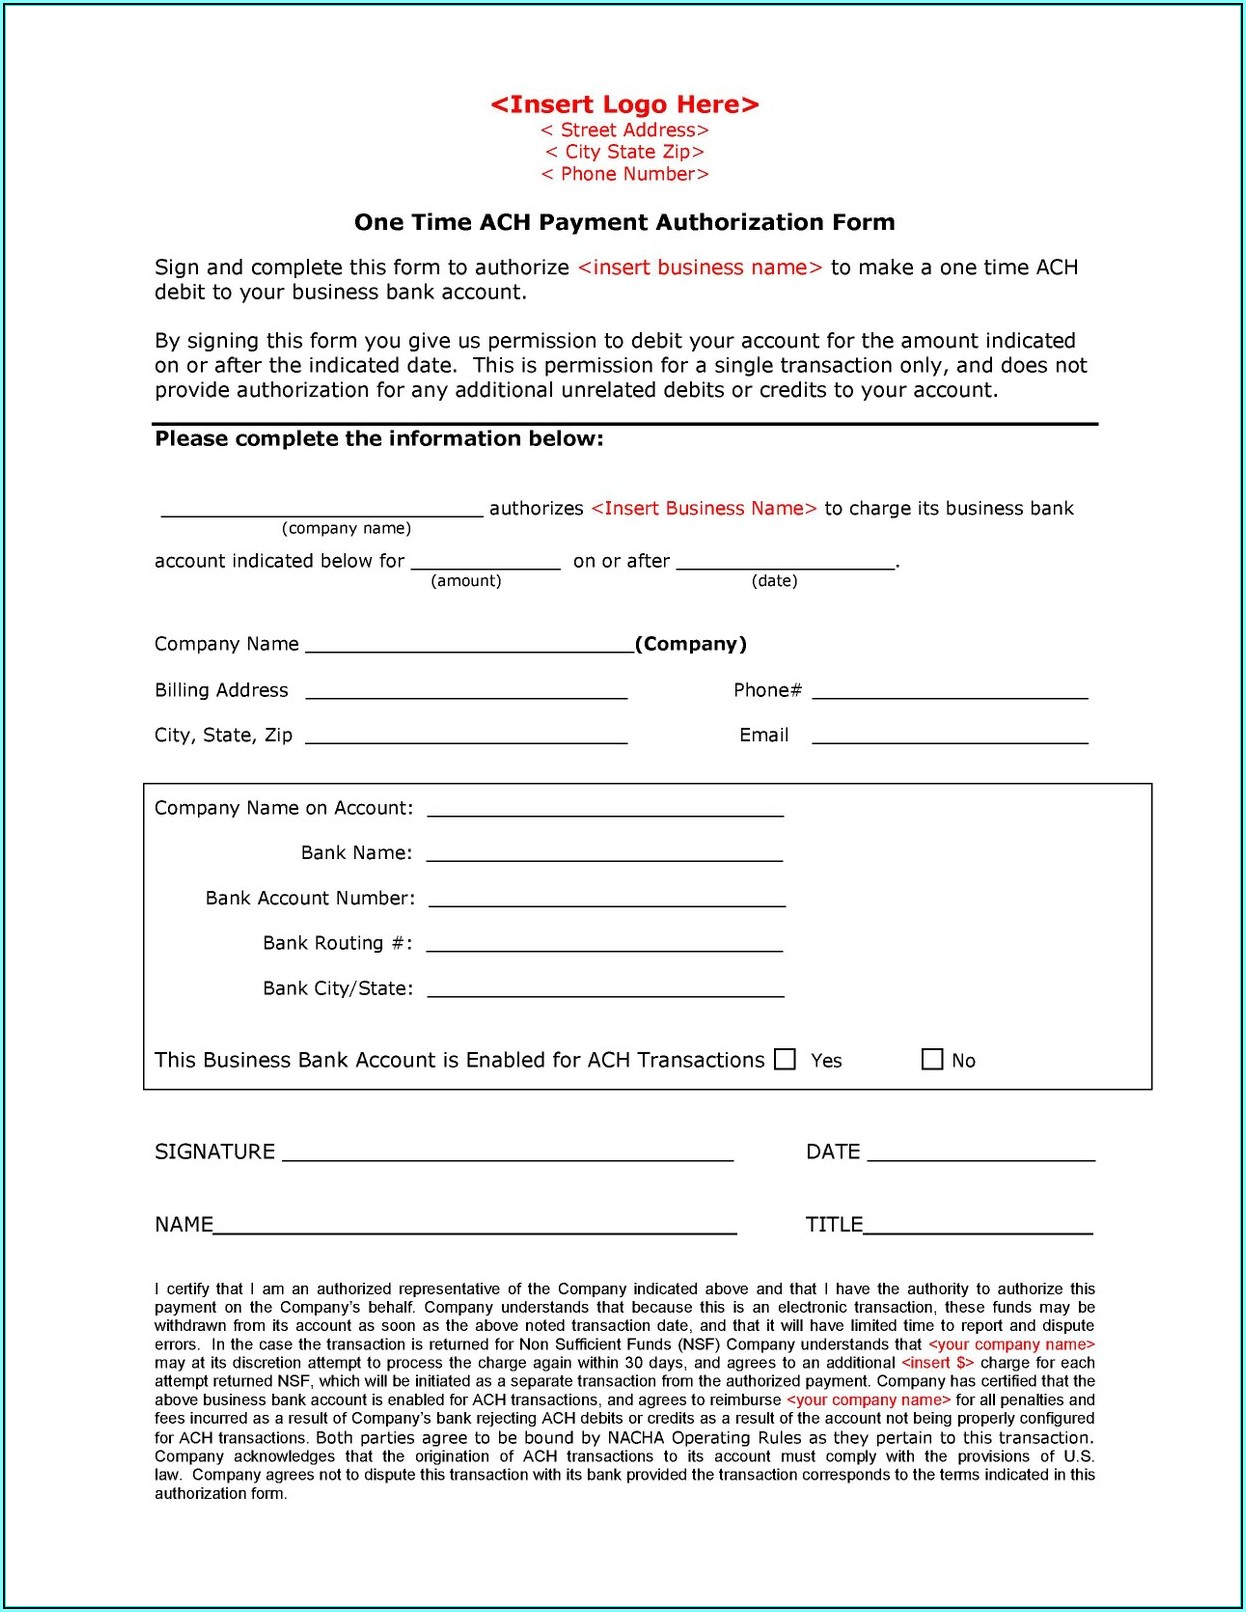 Ach Direct Deposit Form Wells Fargo